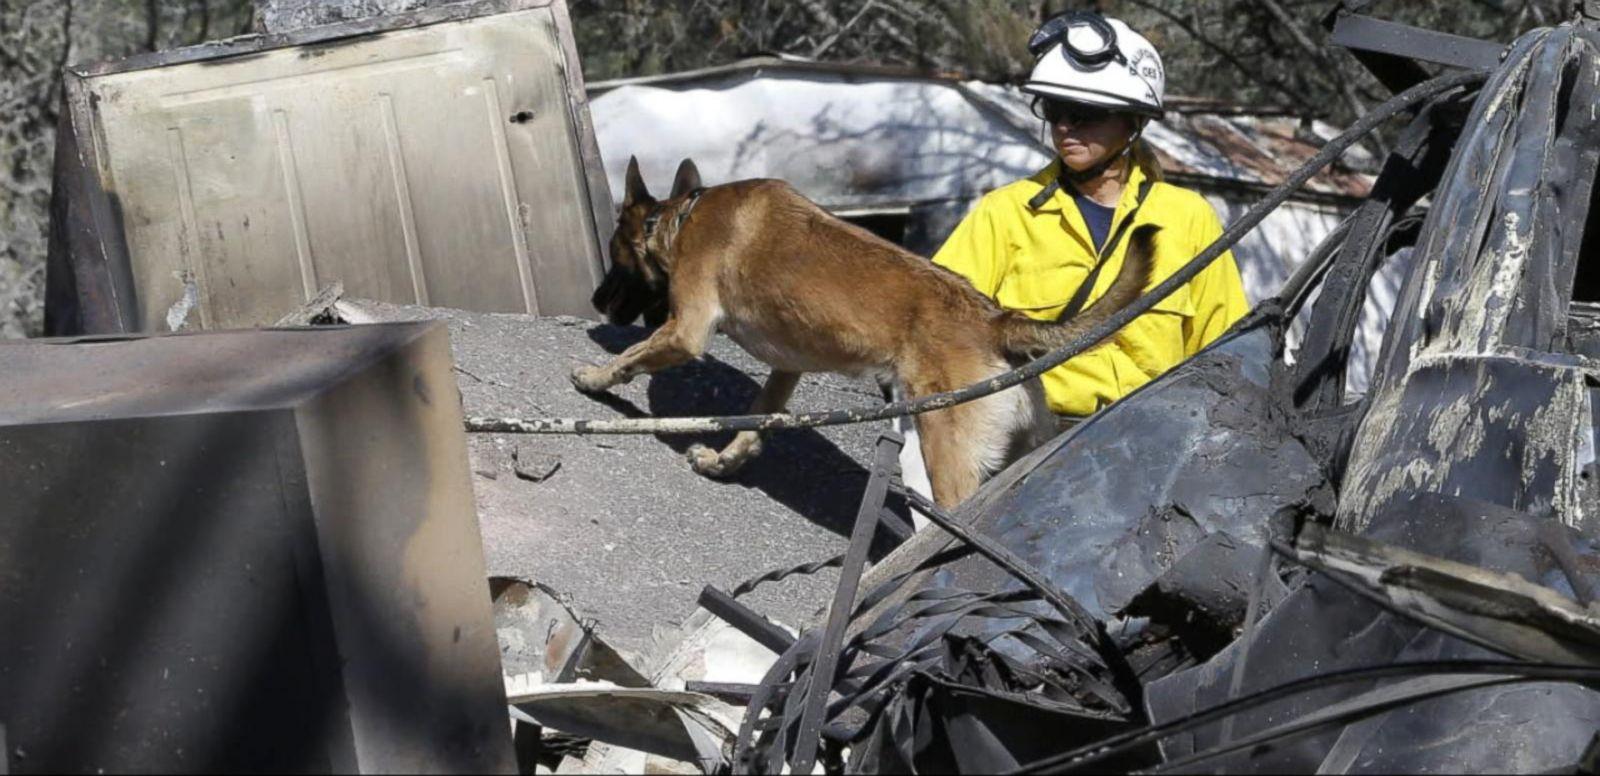 VIDEO: California Wildfire Destroys 200 Homes So Far